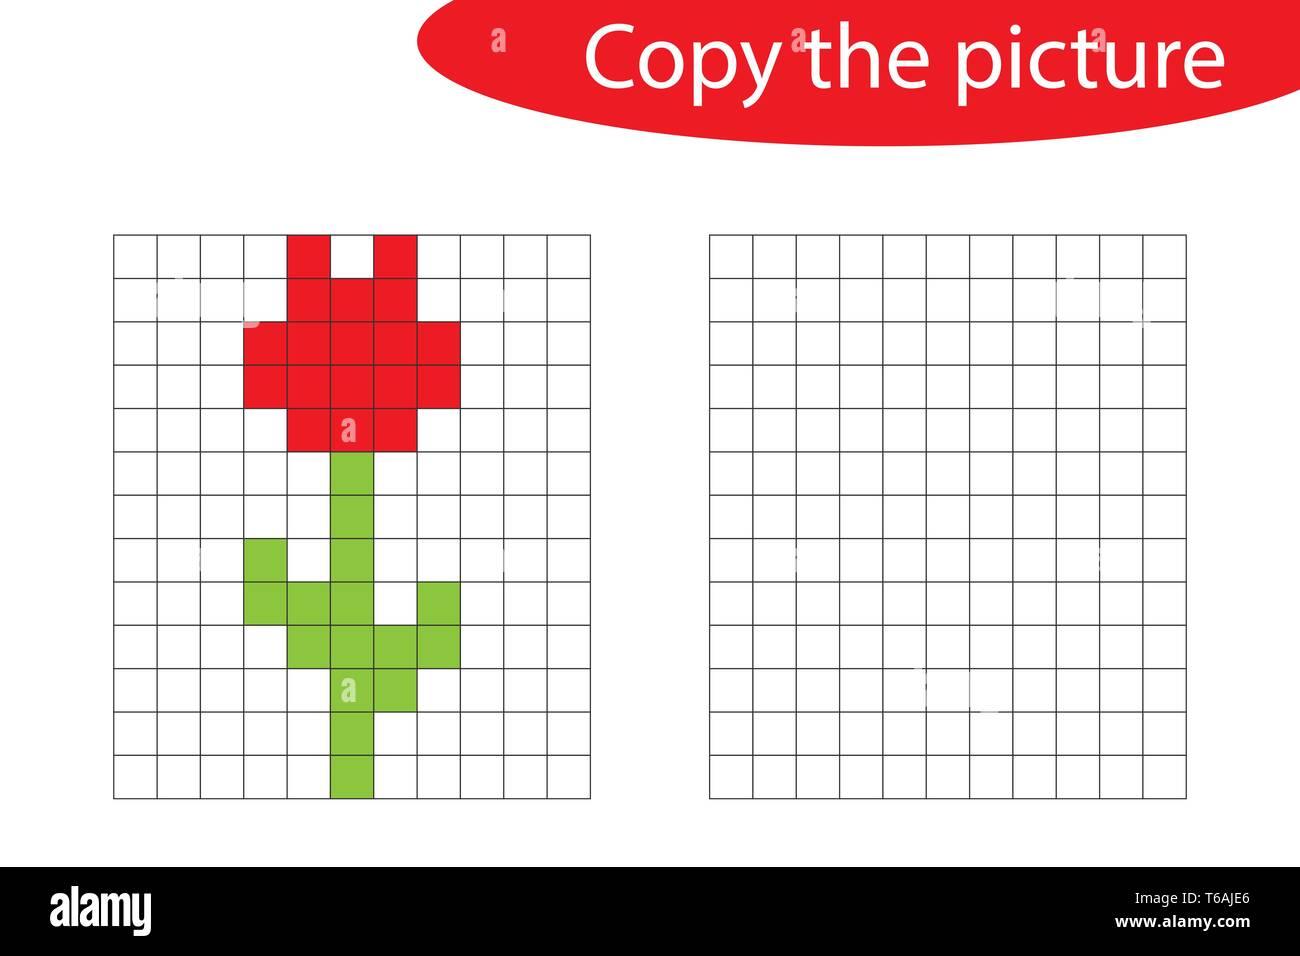 Pixel Photos Pixel Images Page 6 Alamy